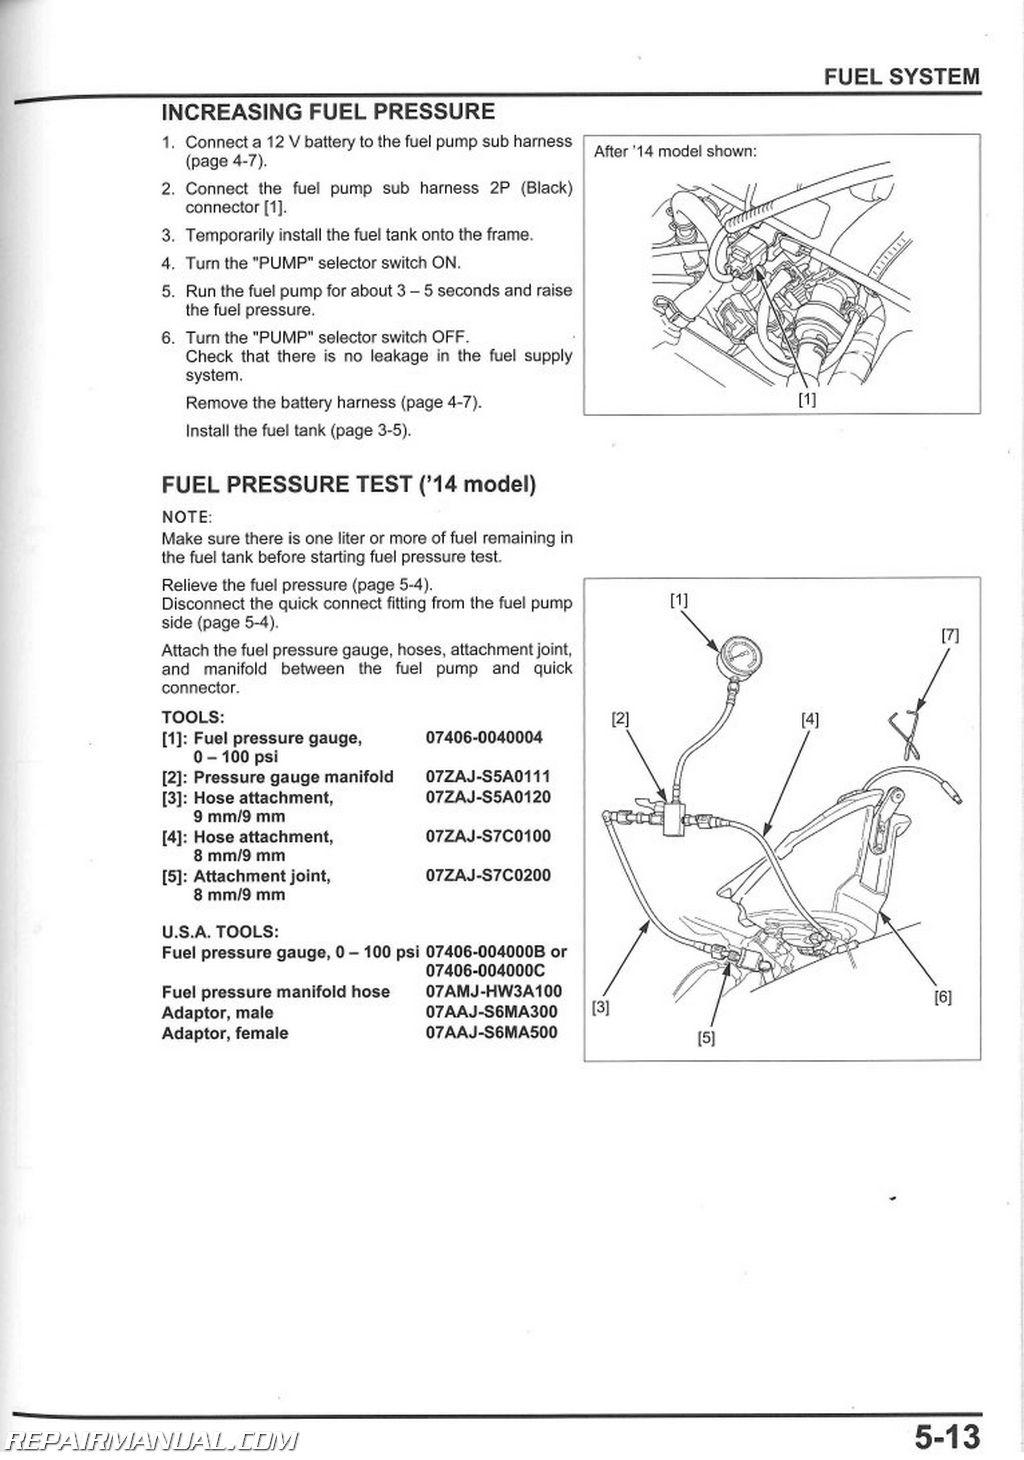 110cc Engine Wiring Diagram Electric Motorcycle 2014 Honda Crf250r Service Manual By Repairmanual Ebay